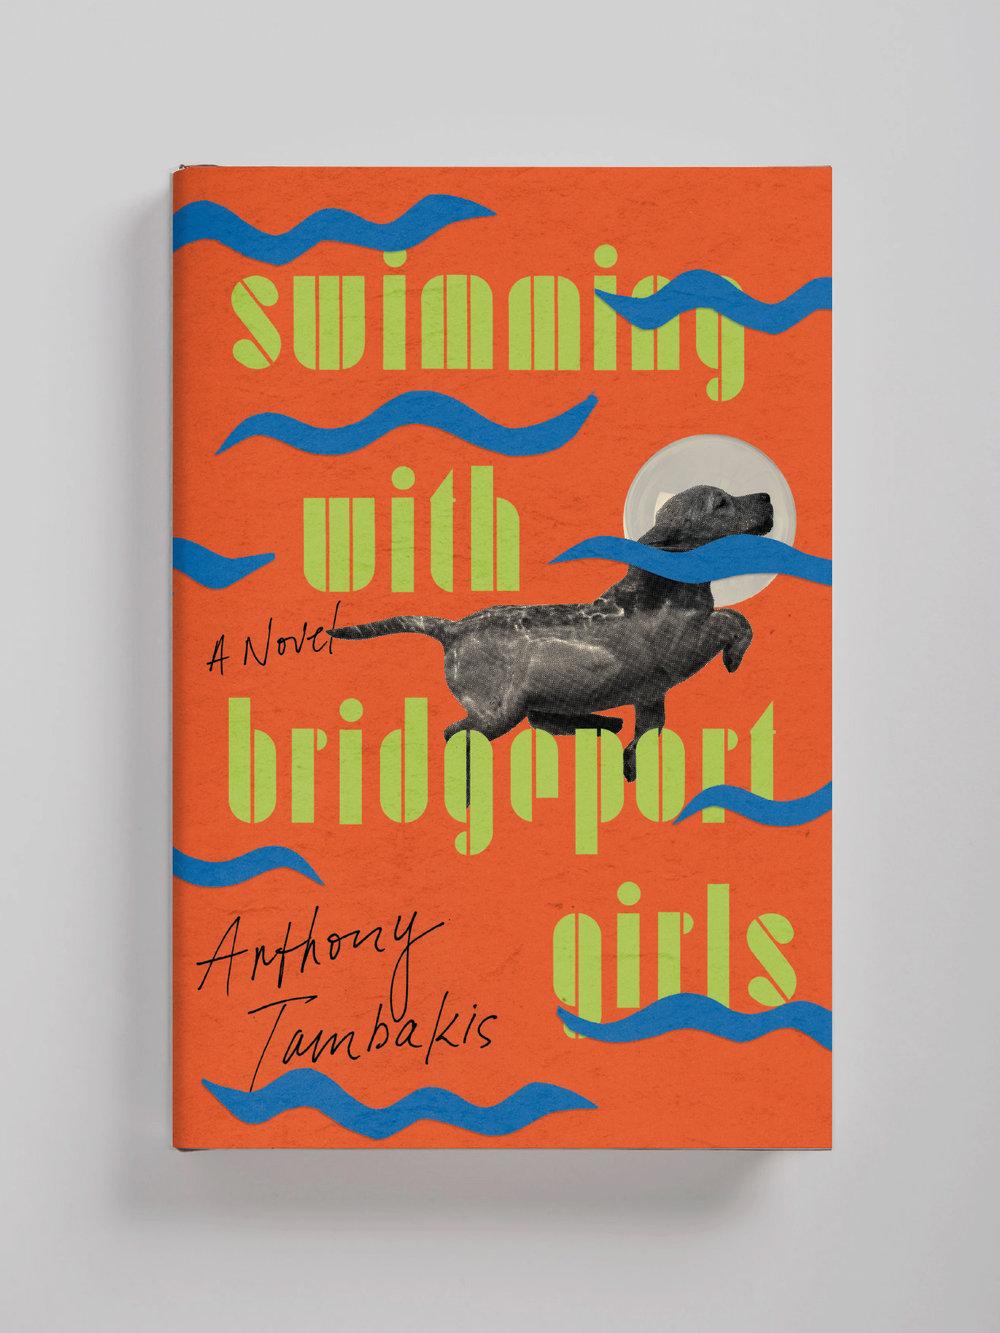 Swimming with Bridgeport Girls unused